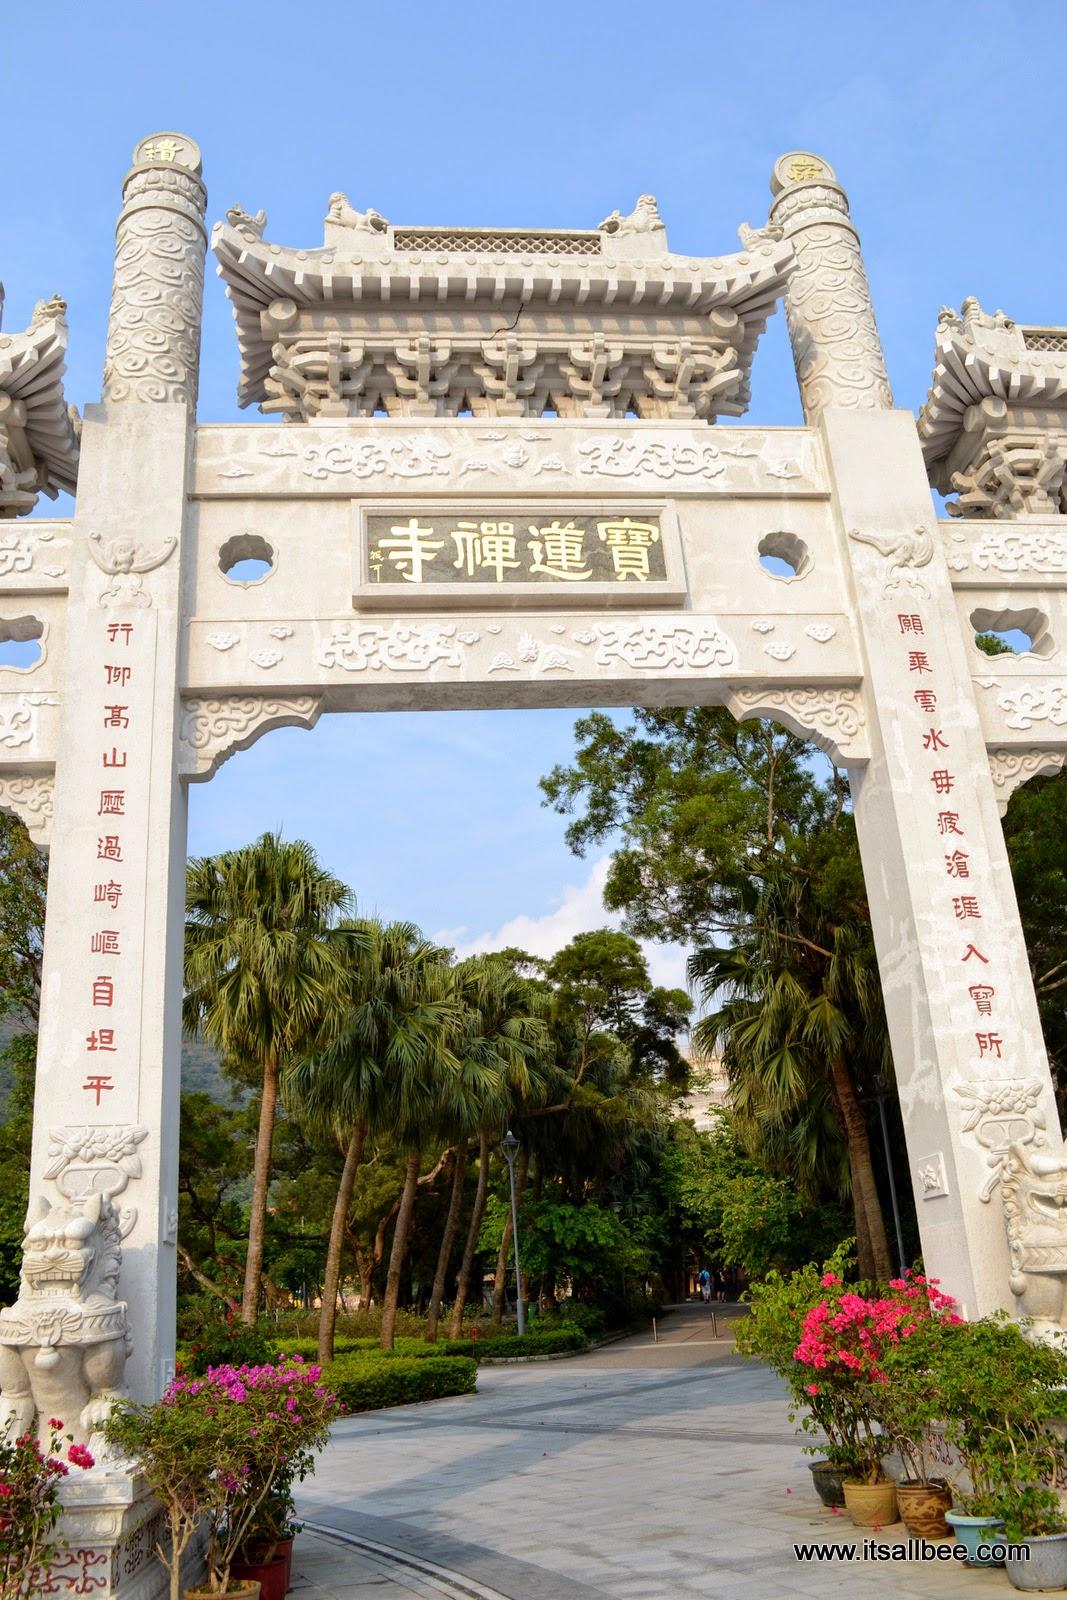 lantau island hk | Big Buddha | gates | lantau island hk | Big Buddha | Monastery lantau island